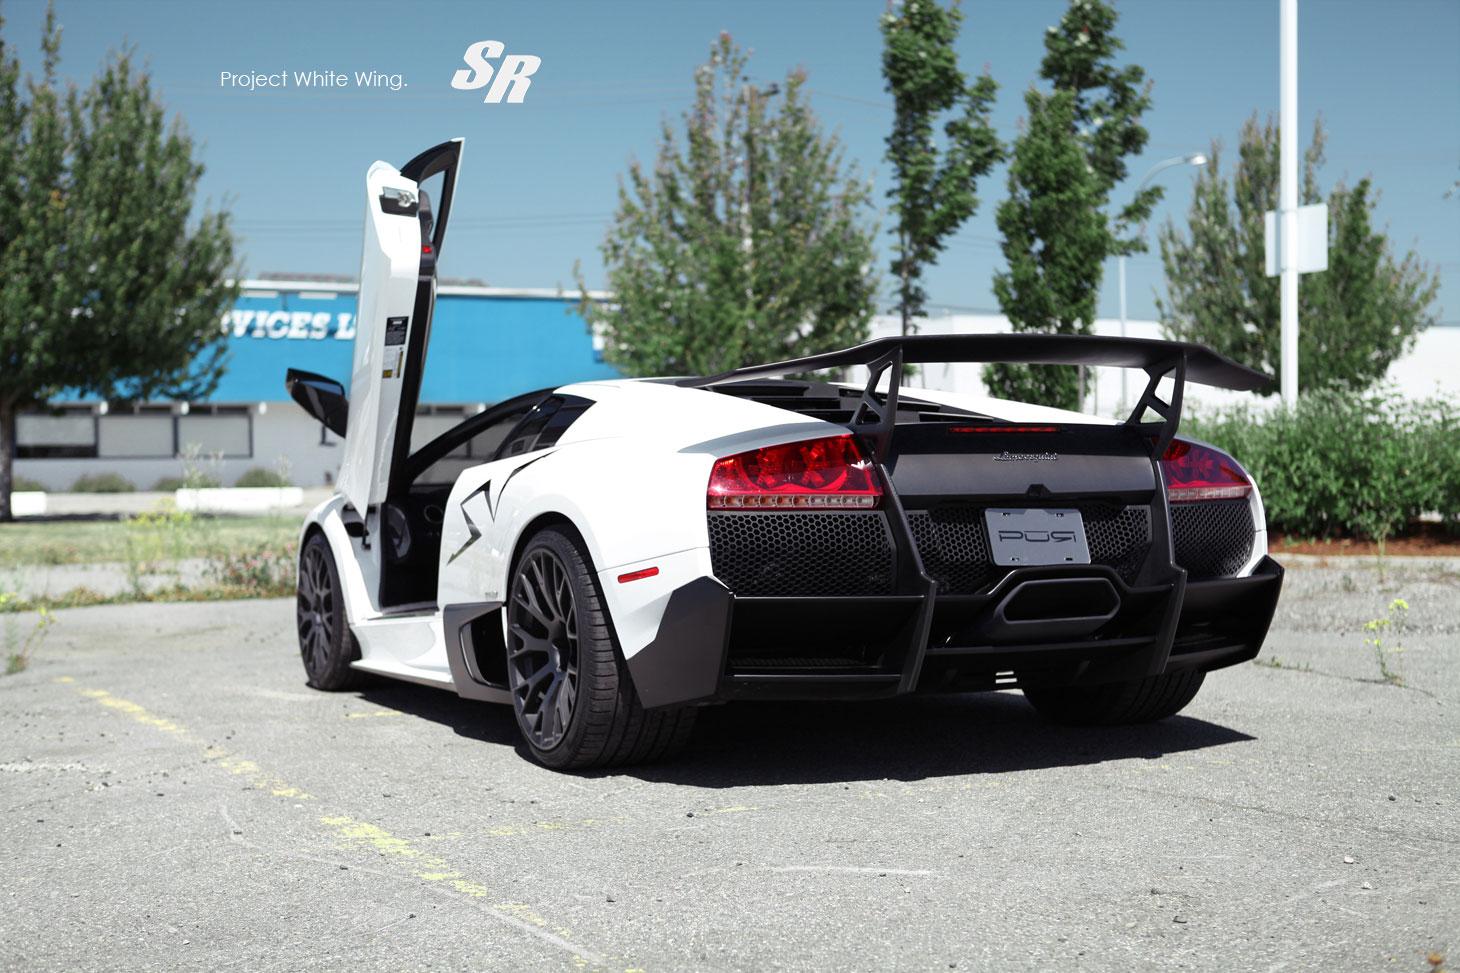 Lamborghini Murcielago LP670-4 SV jako Project White Wing 5